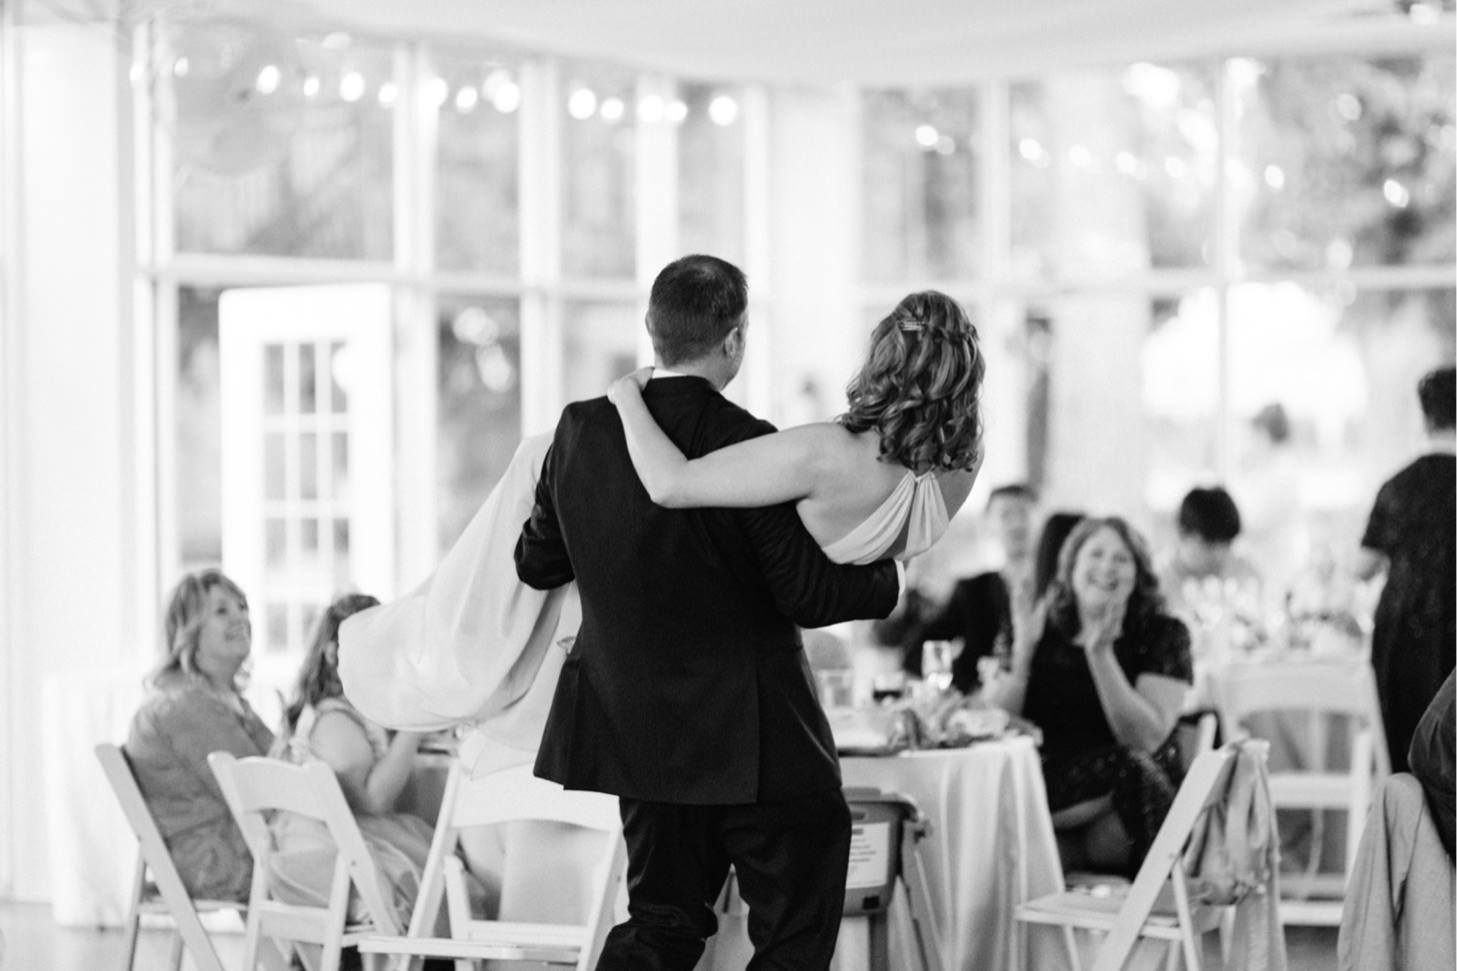 ritz-charles-wedding-reception-downtown-indianapolis-wedding-photographer057.JPG